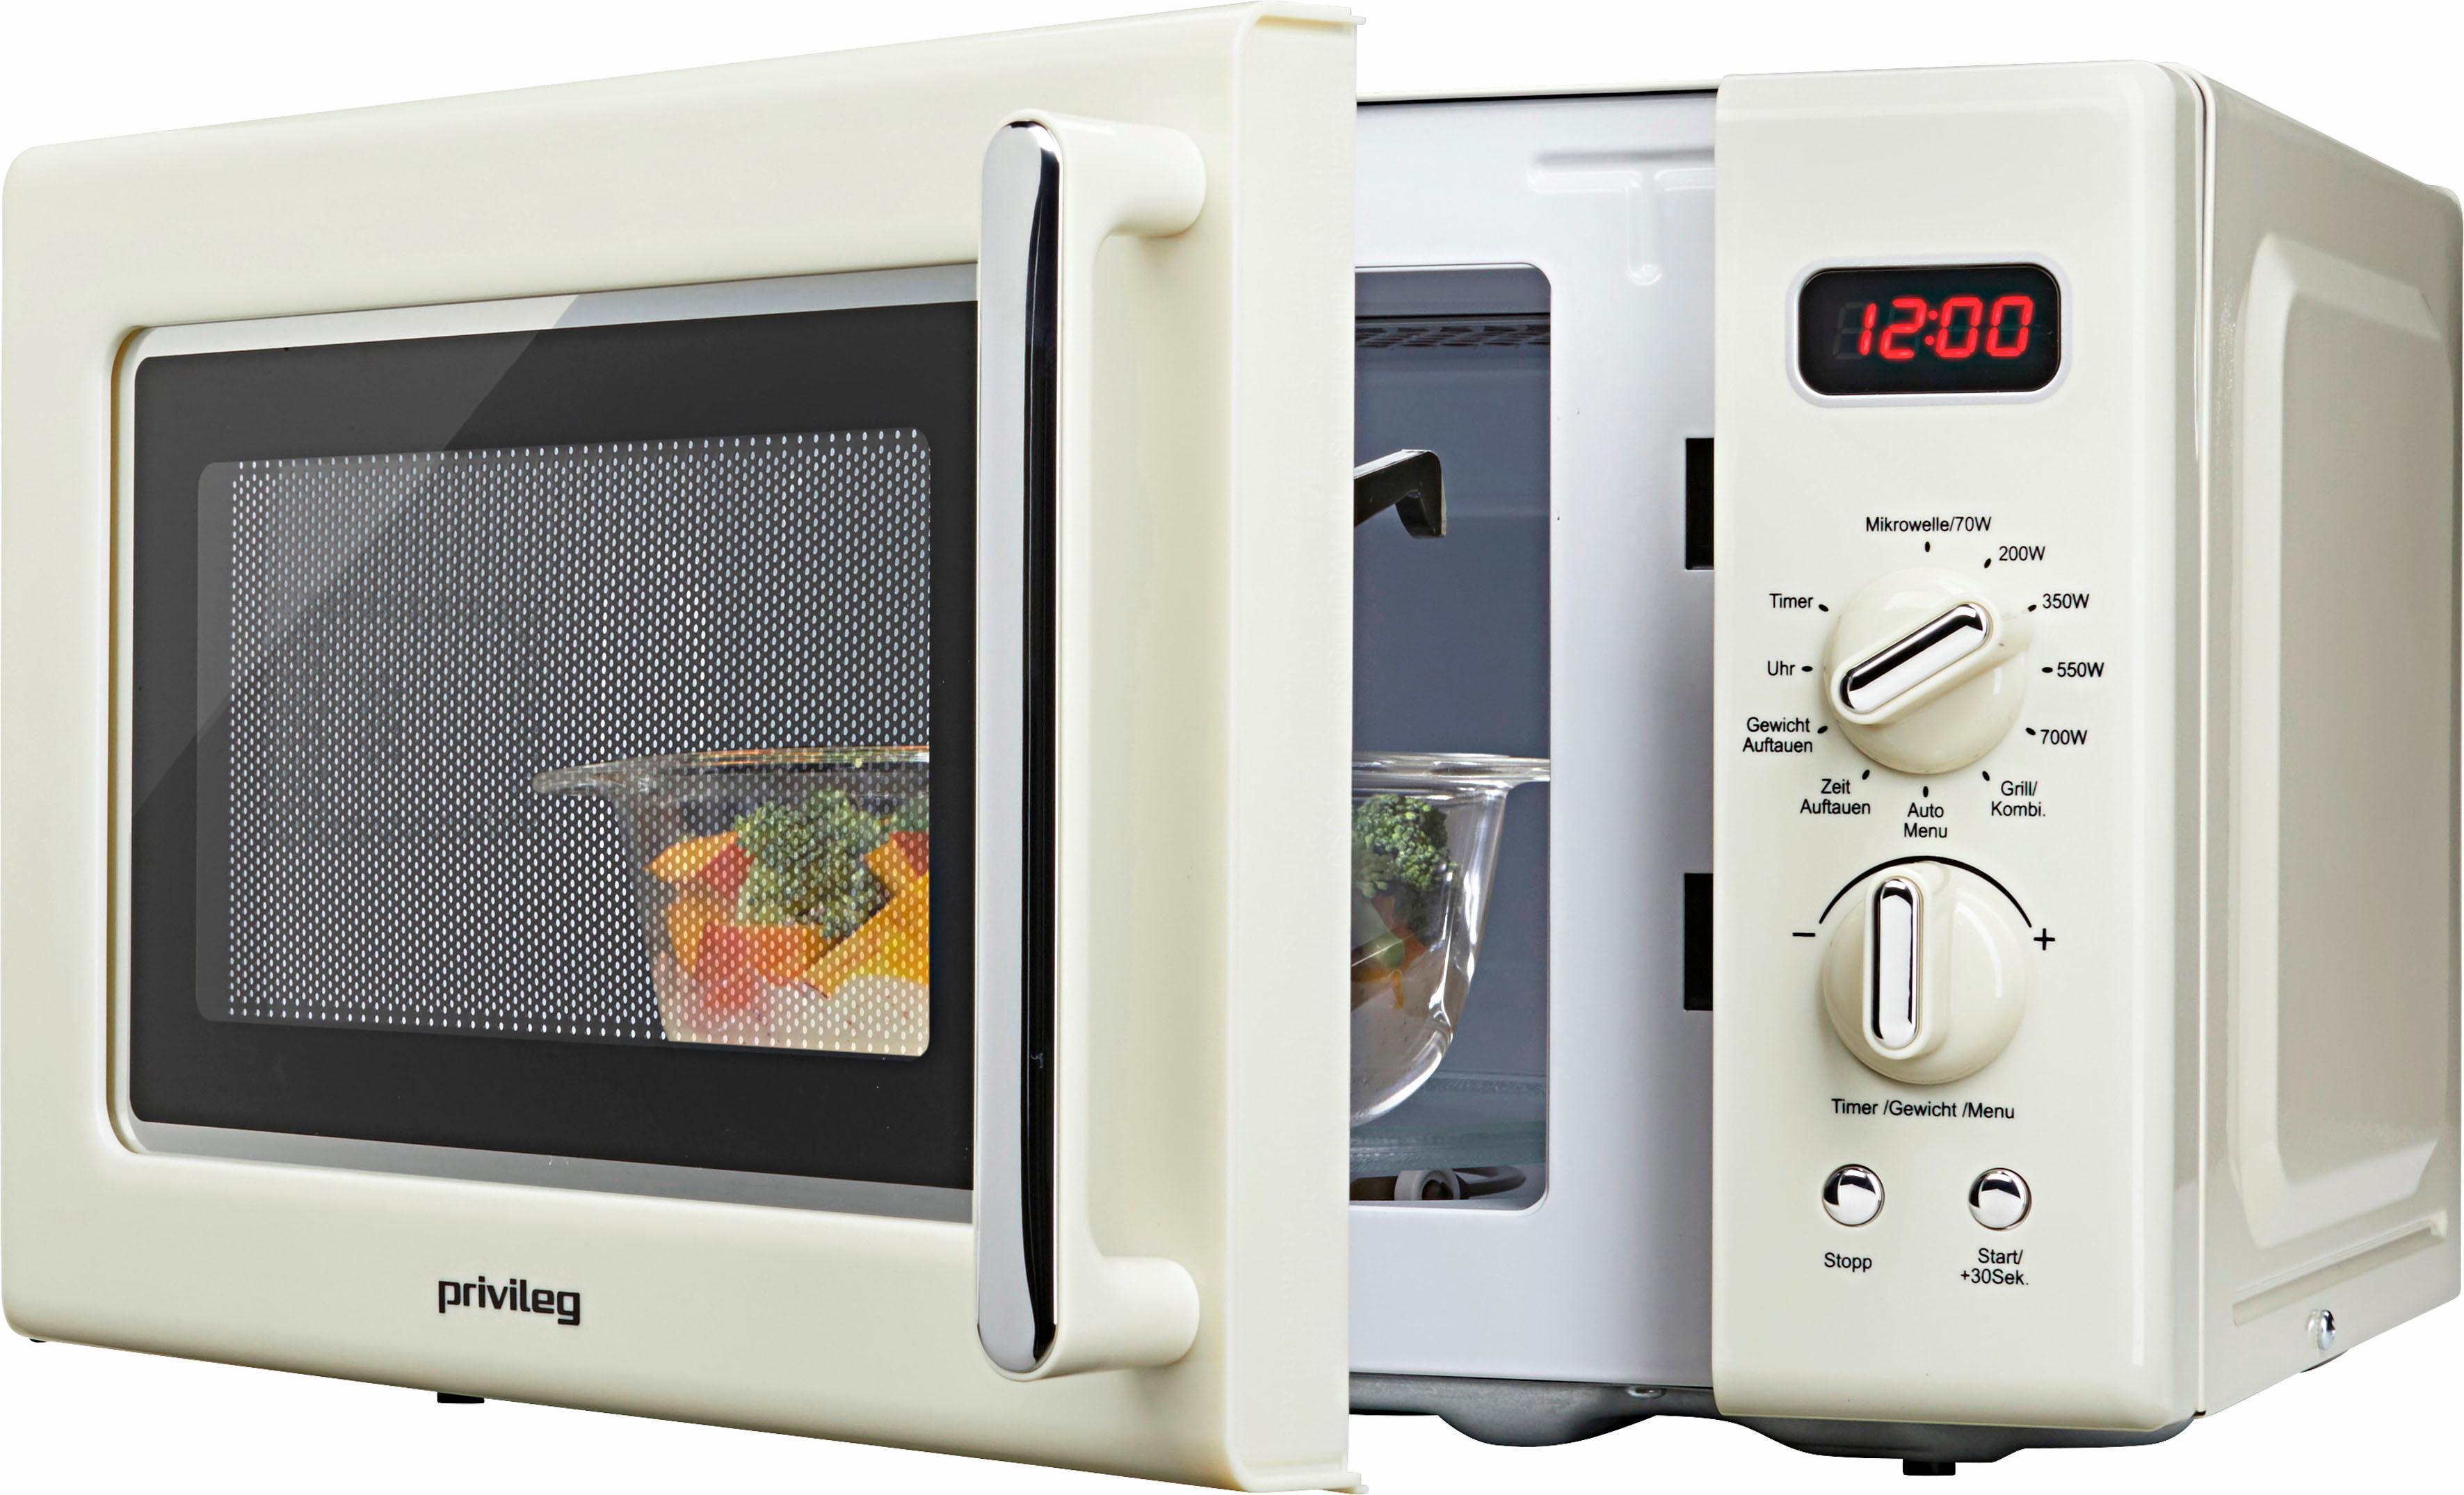 *Privileg Mikrowelle »670559«, Grill, 700 W, im Retro-Design, 8 Automatikprogramme, beige*